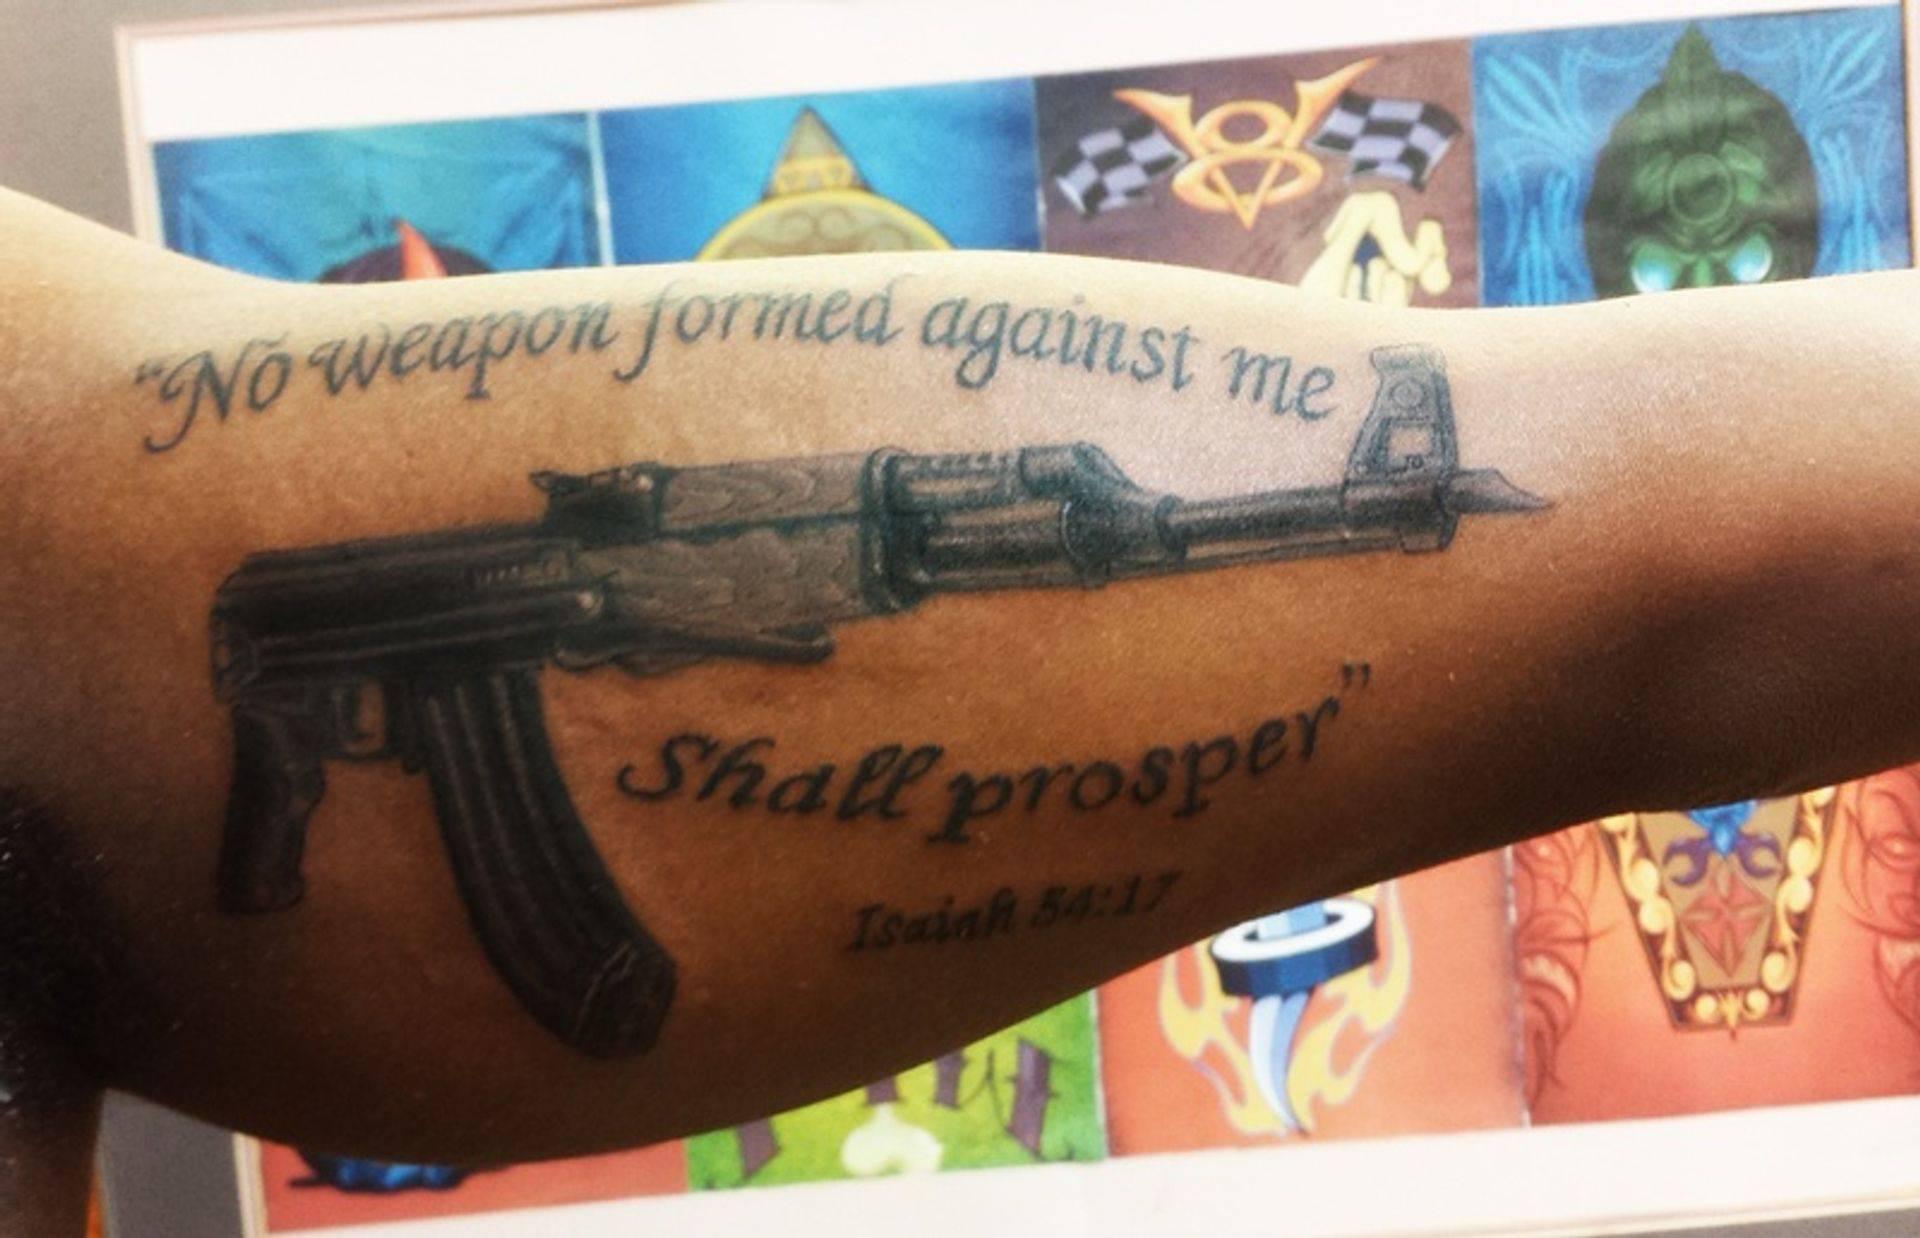 AK 47 Gun tattoo